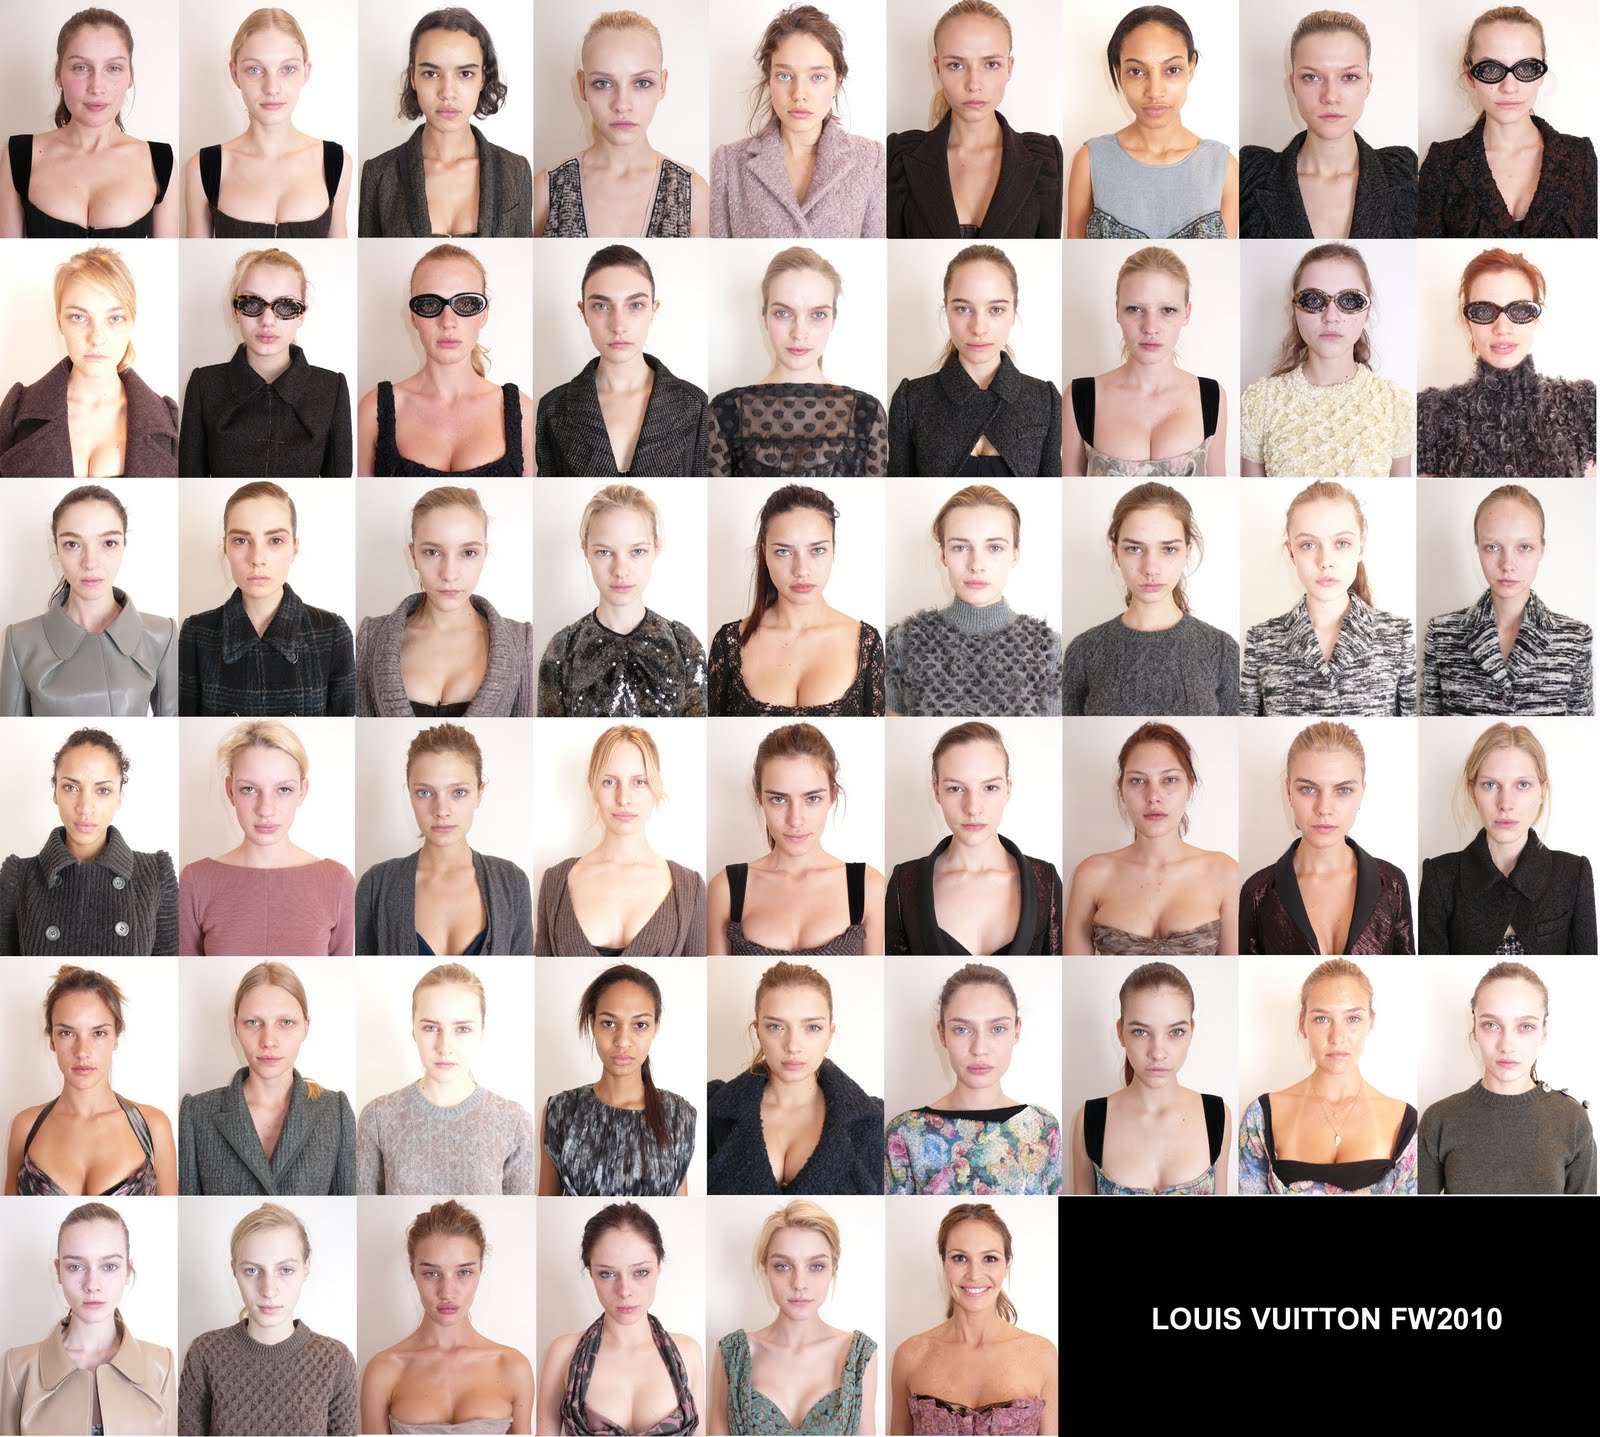 http://3.bp.blogspot.com/-UNBW_EsEAFk/T9OVit9BM1I/AAAAAAAAAWY/NwqFrRC-2ic/s1600/vuitton+models.jpg